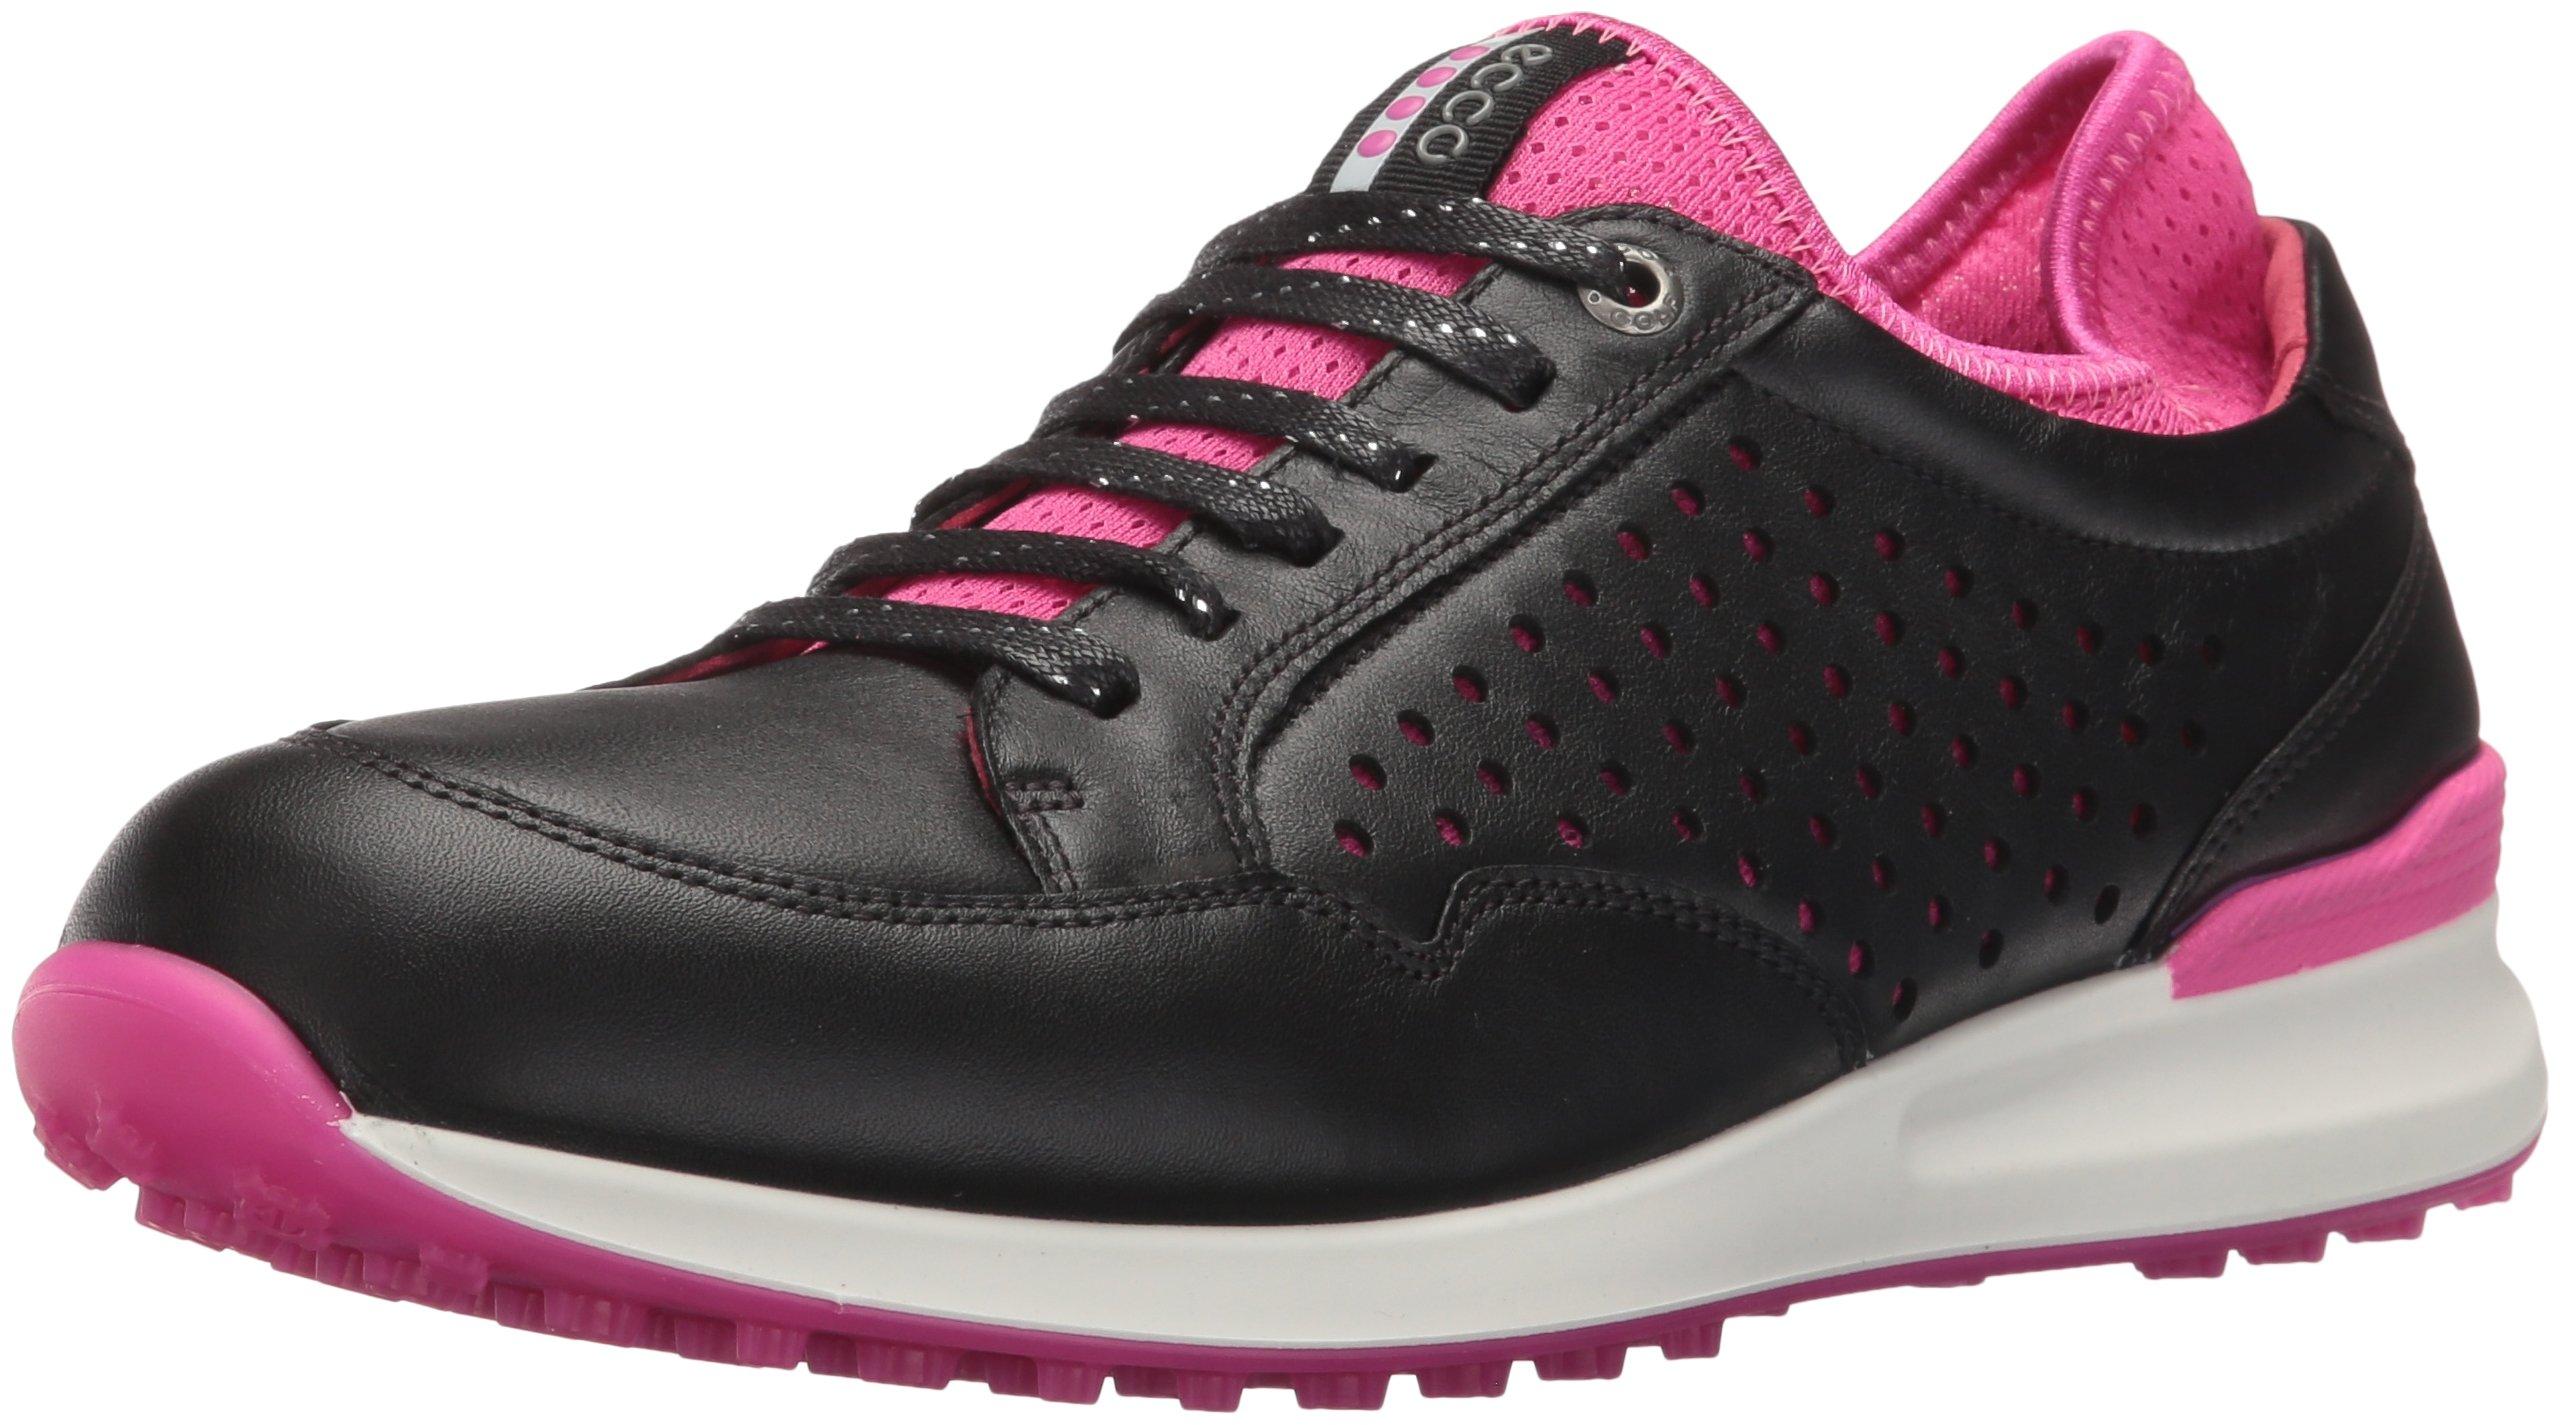 ECCO Women's Speed Hybrid Golf Shoe, Black/Raspberry, 36 EU/5-5.5 M US